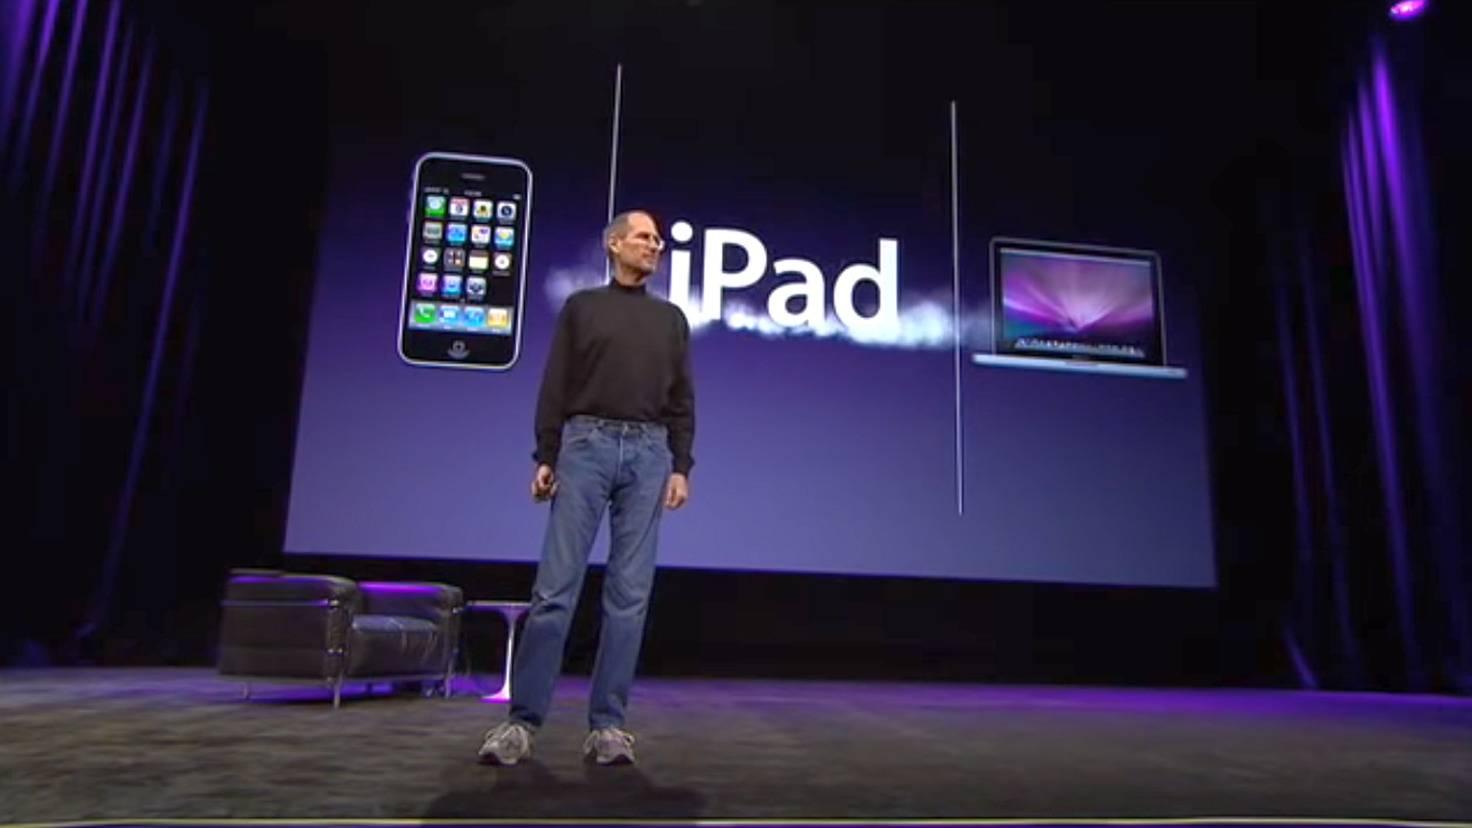 ipad-1-apple-steve-jobs-iphone-macbook